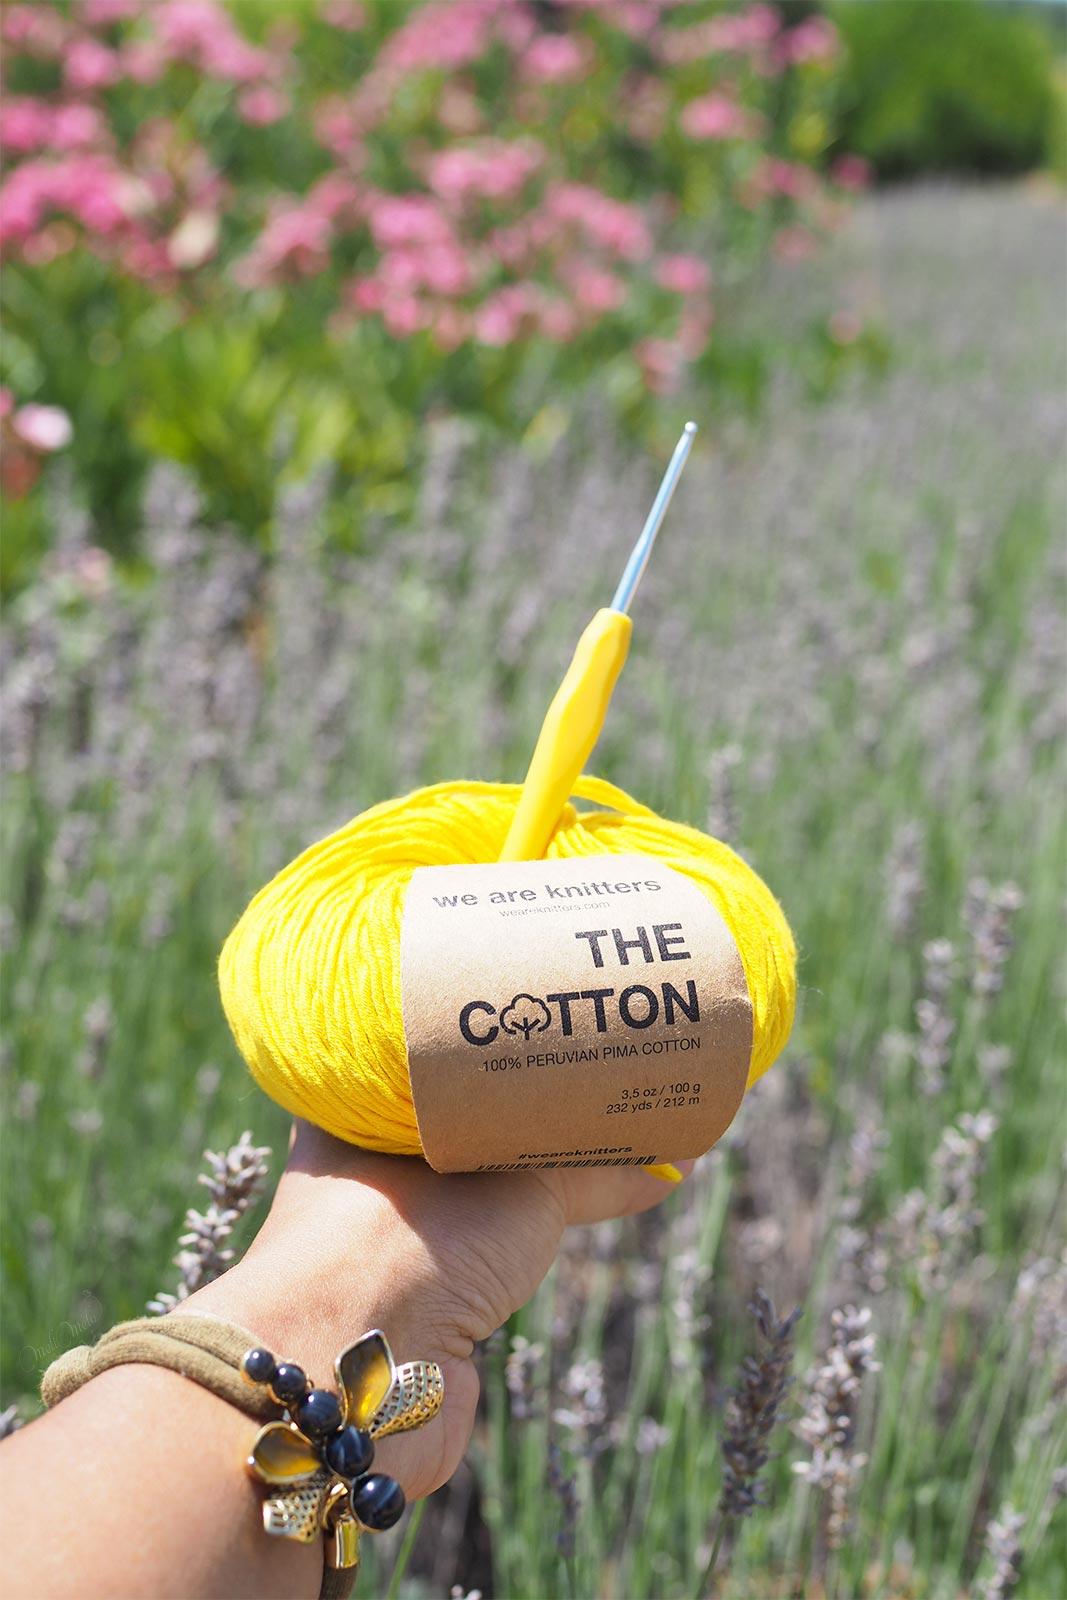 coton-pima-jaune-yellow-the-cotton-wool-weareknitters-summervibs-laboutiquedemelimelo